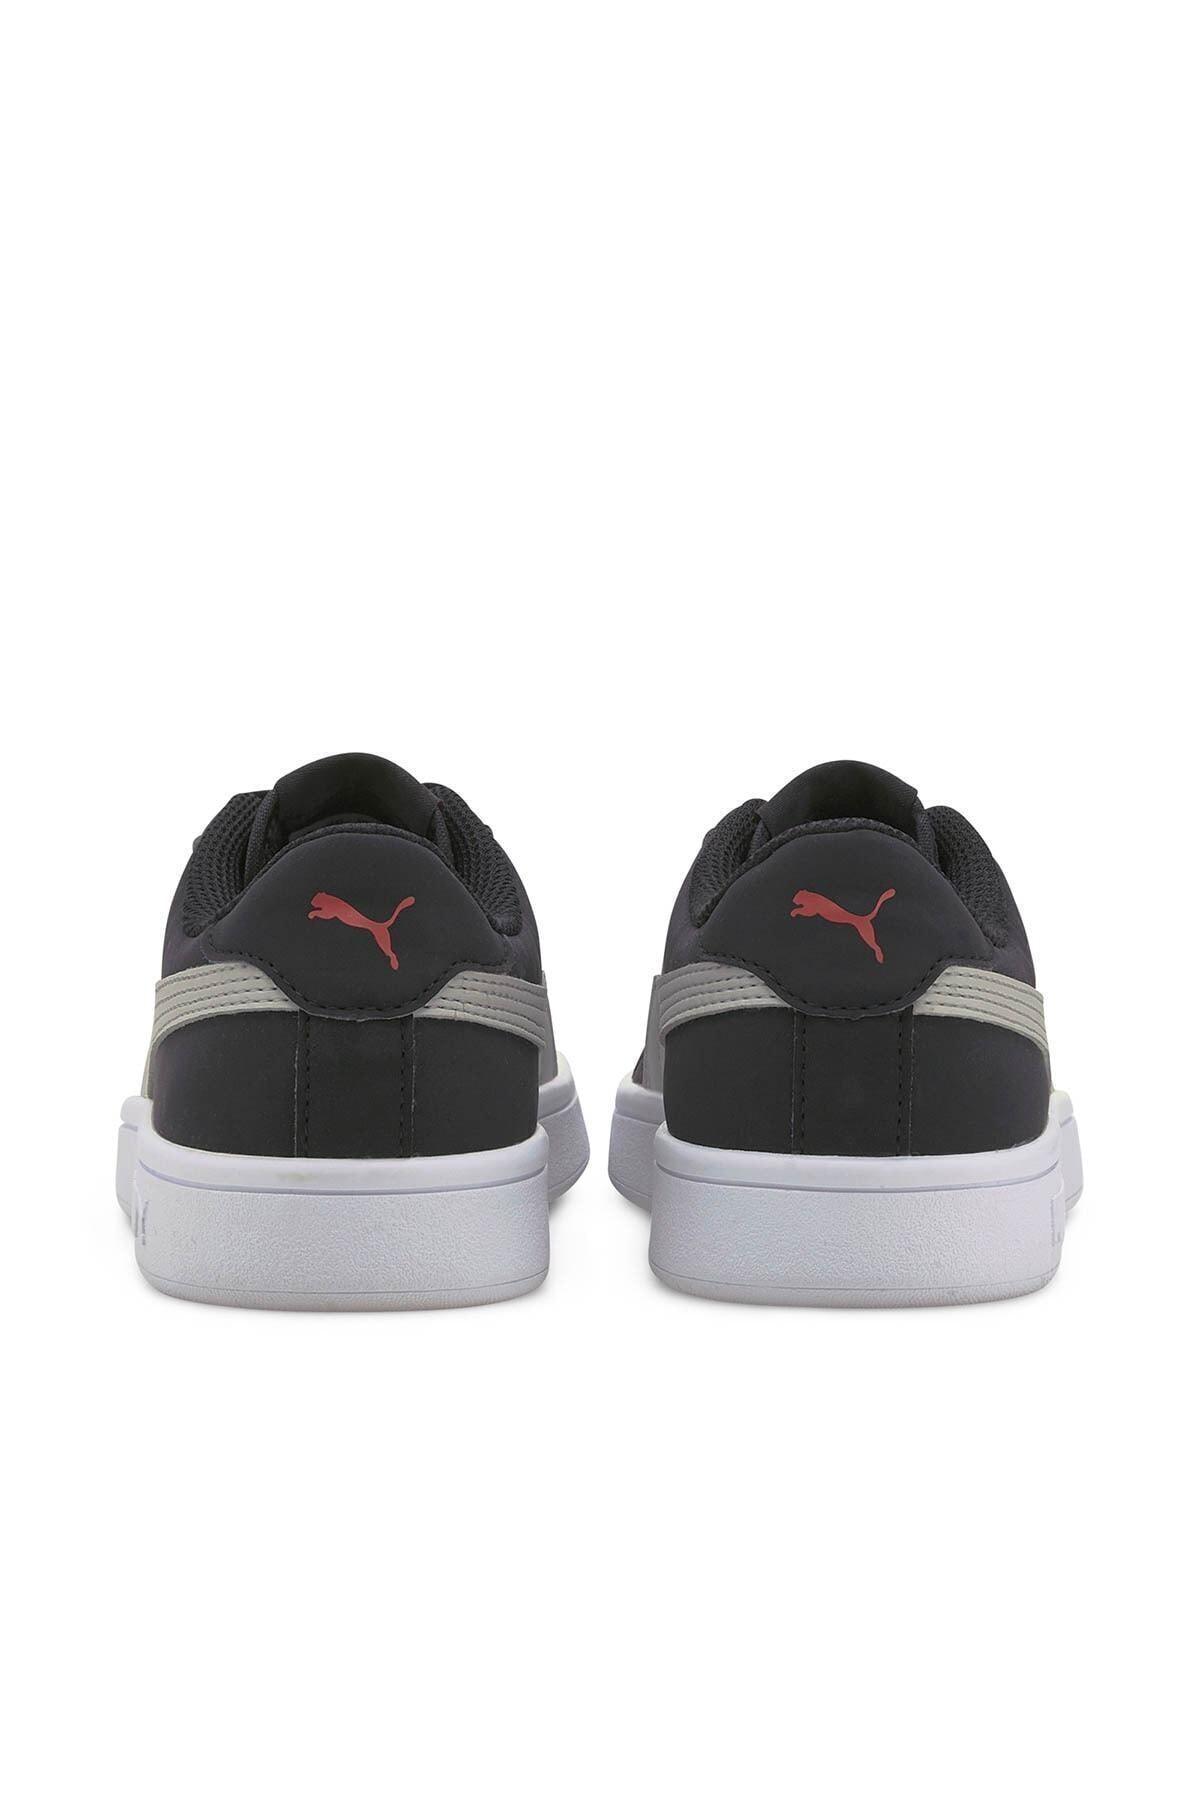 Puma Kadın Sneaker - Smash V2 Buck Jr - 36518219 2